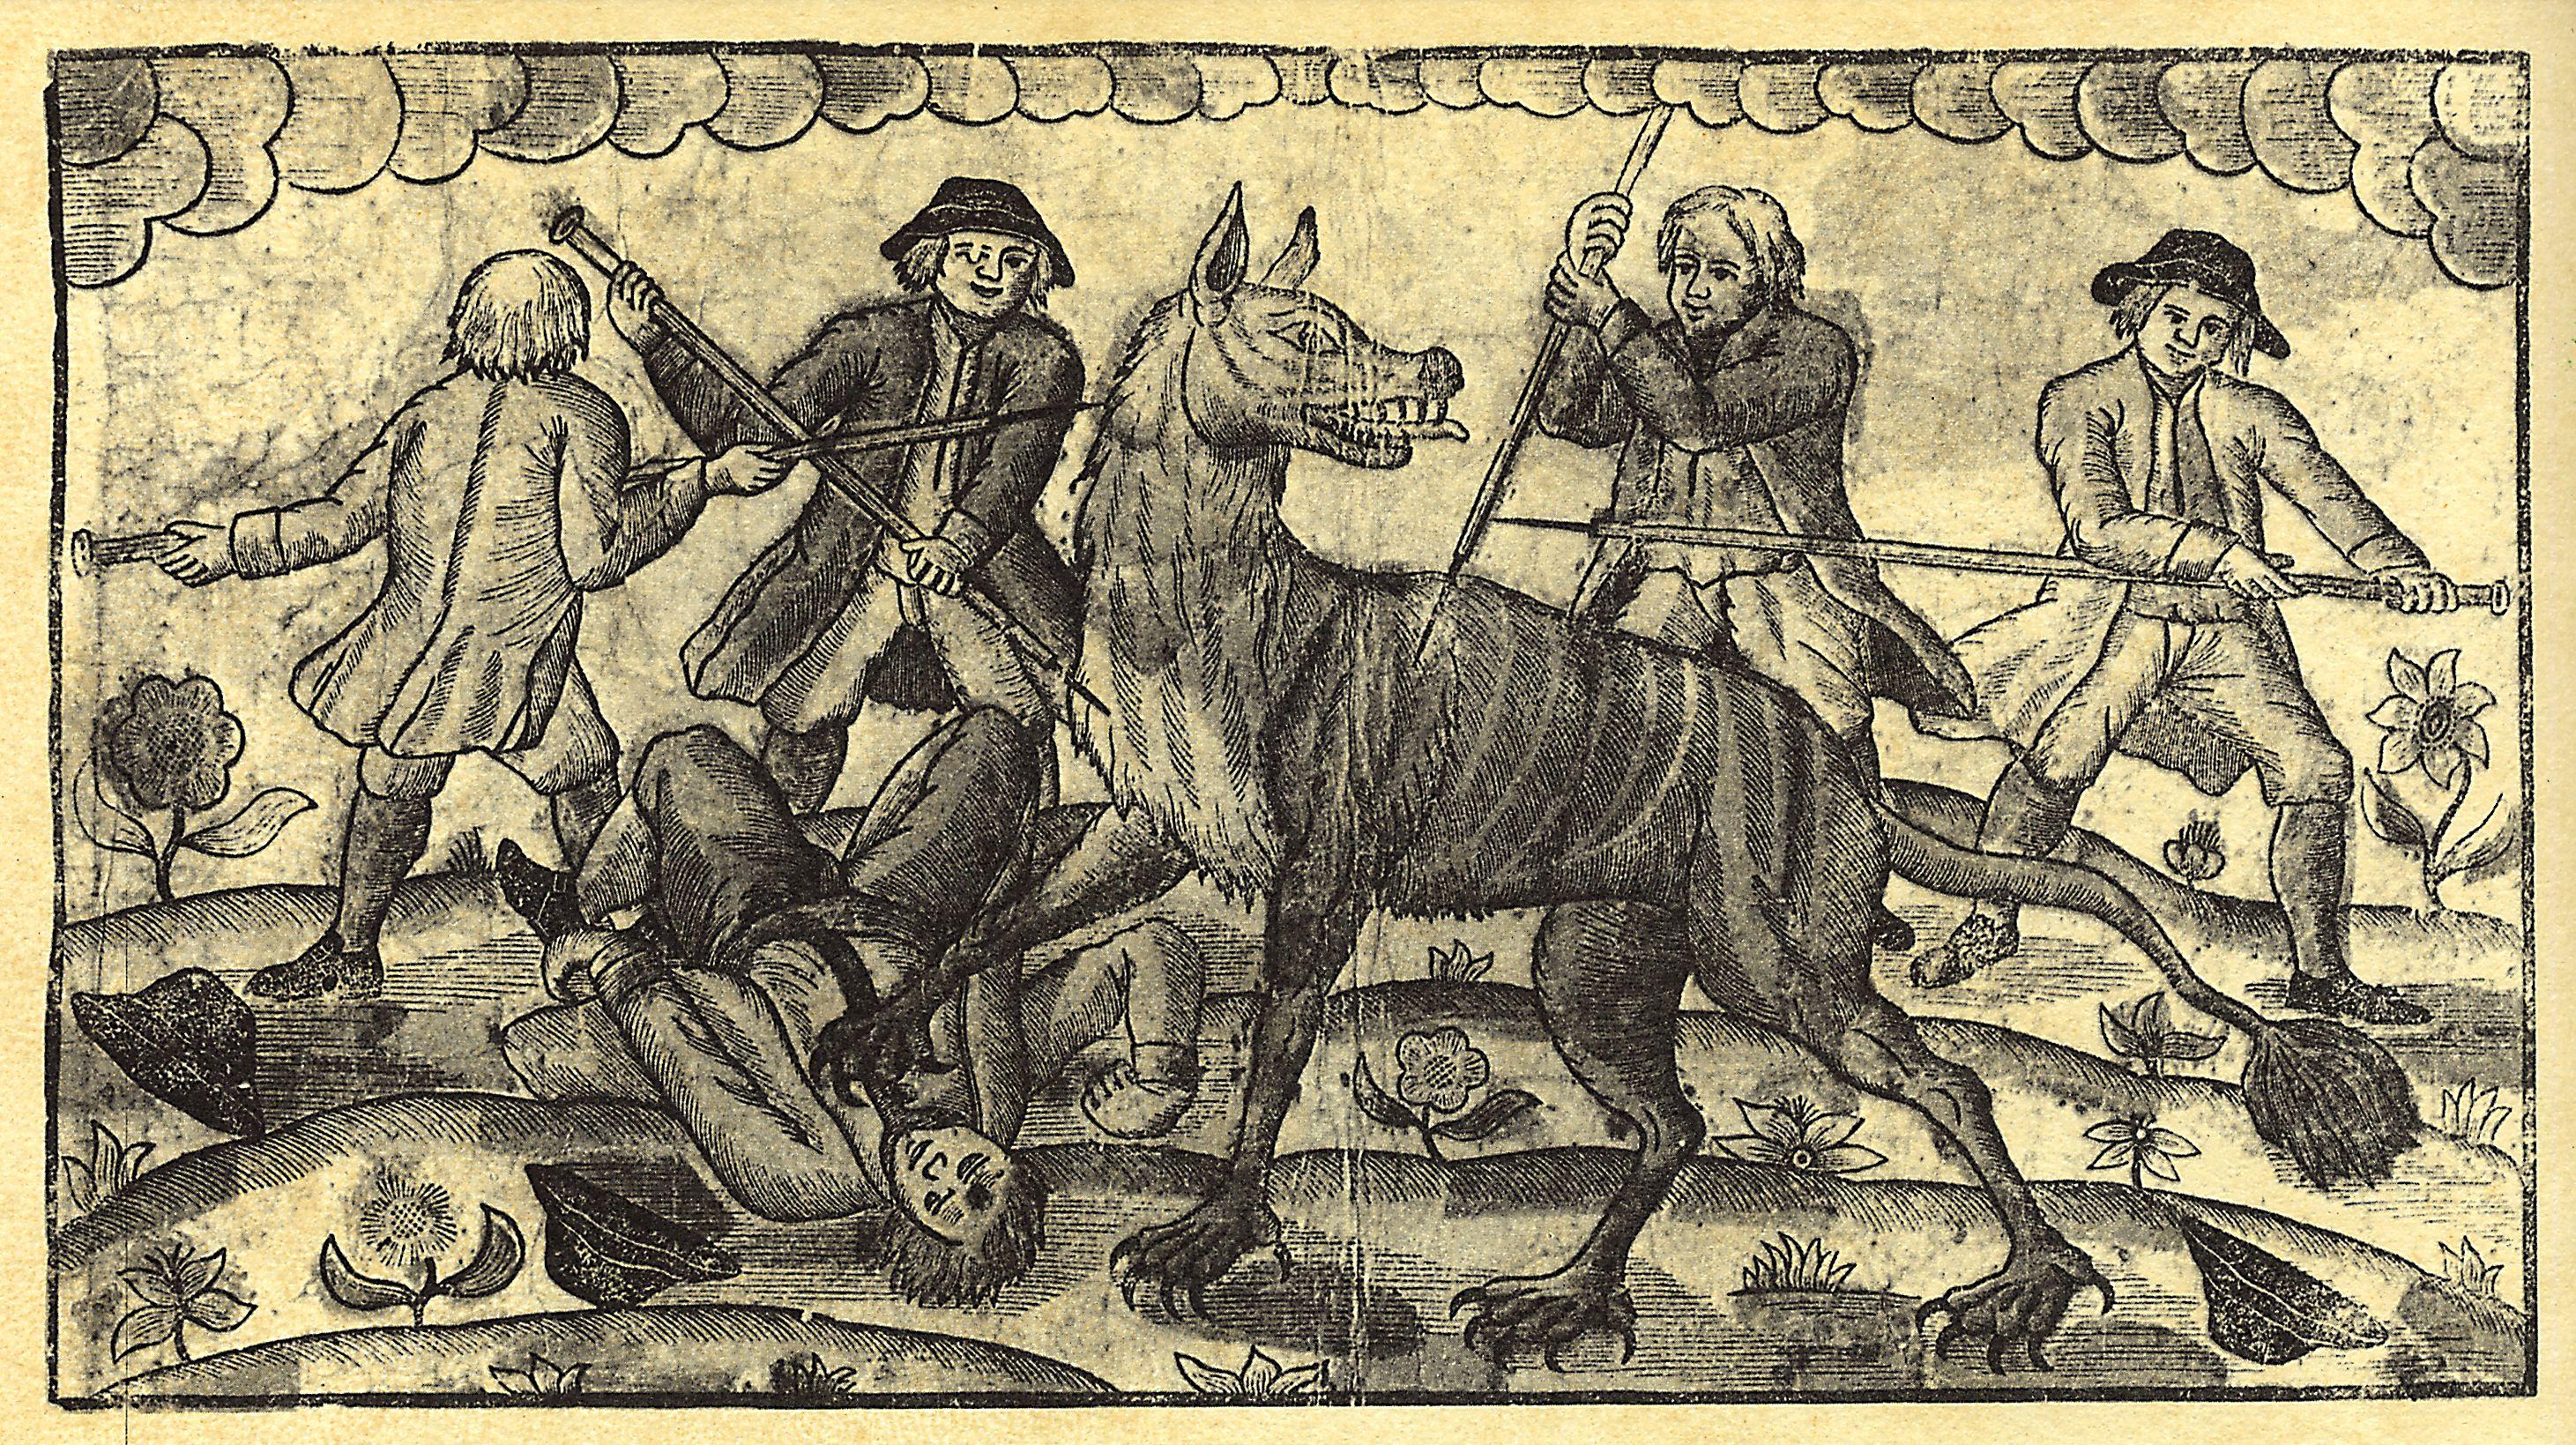 A danish newspaper from copenhagen depicts the Gévaudan creature